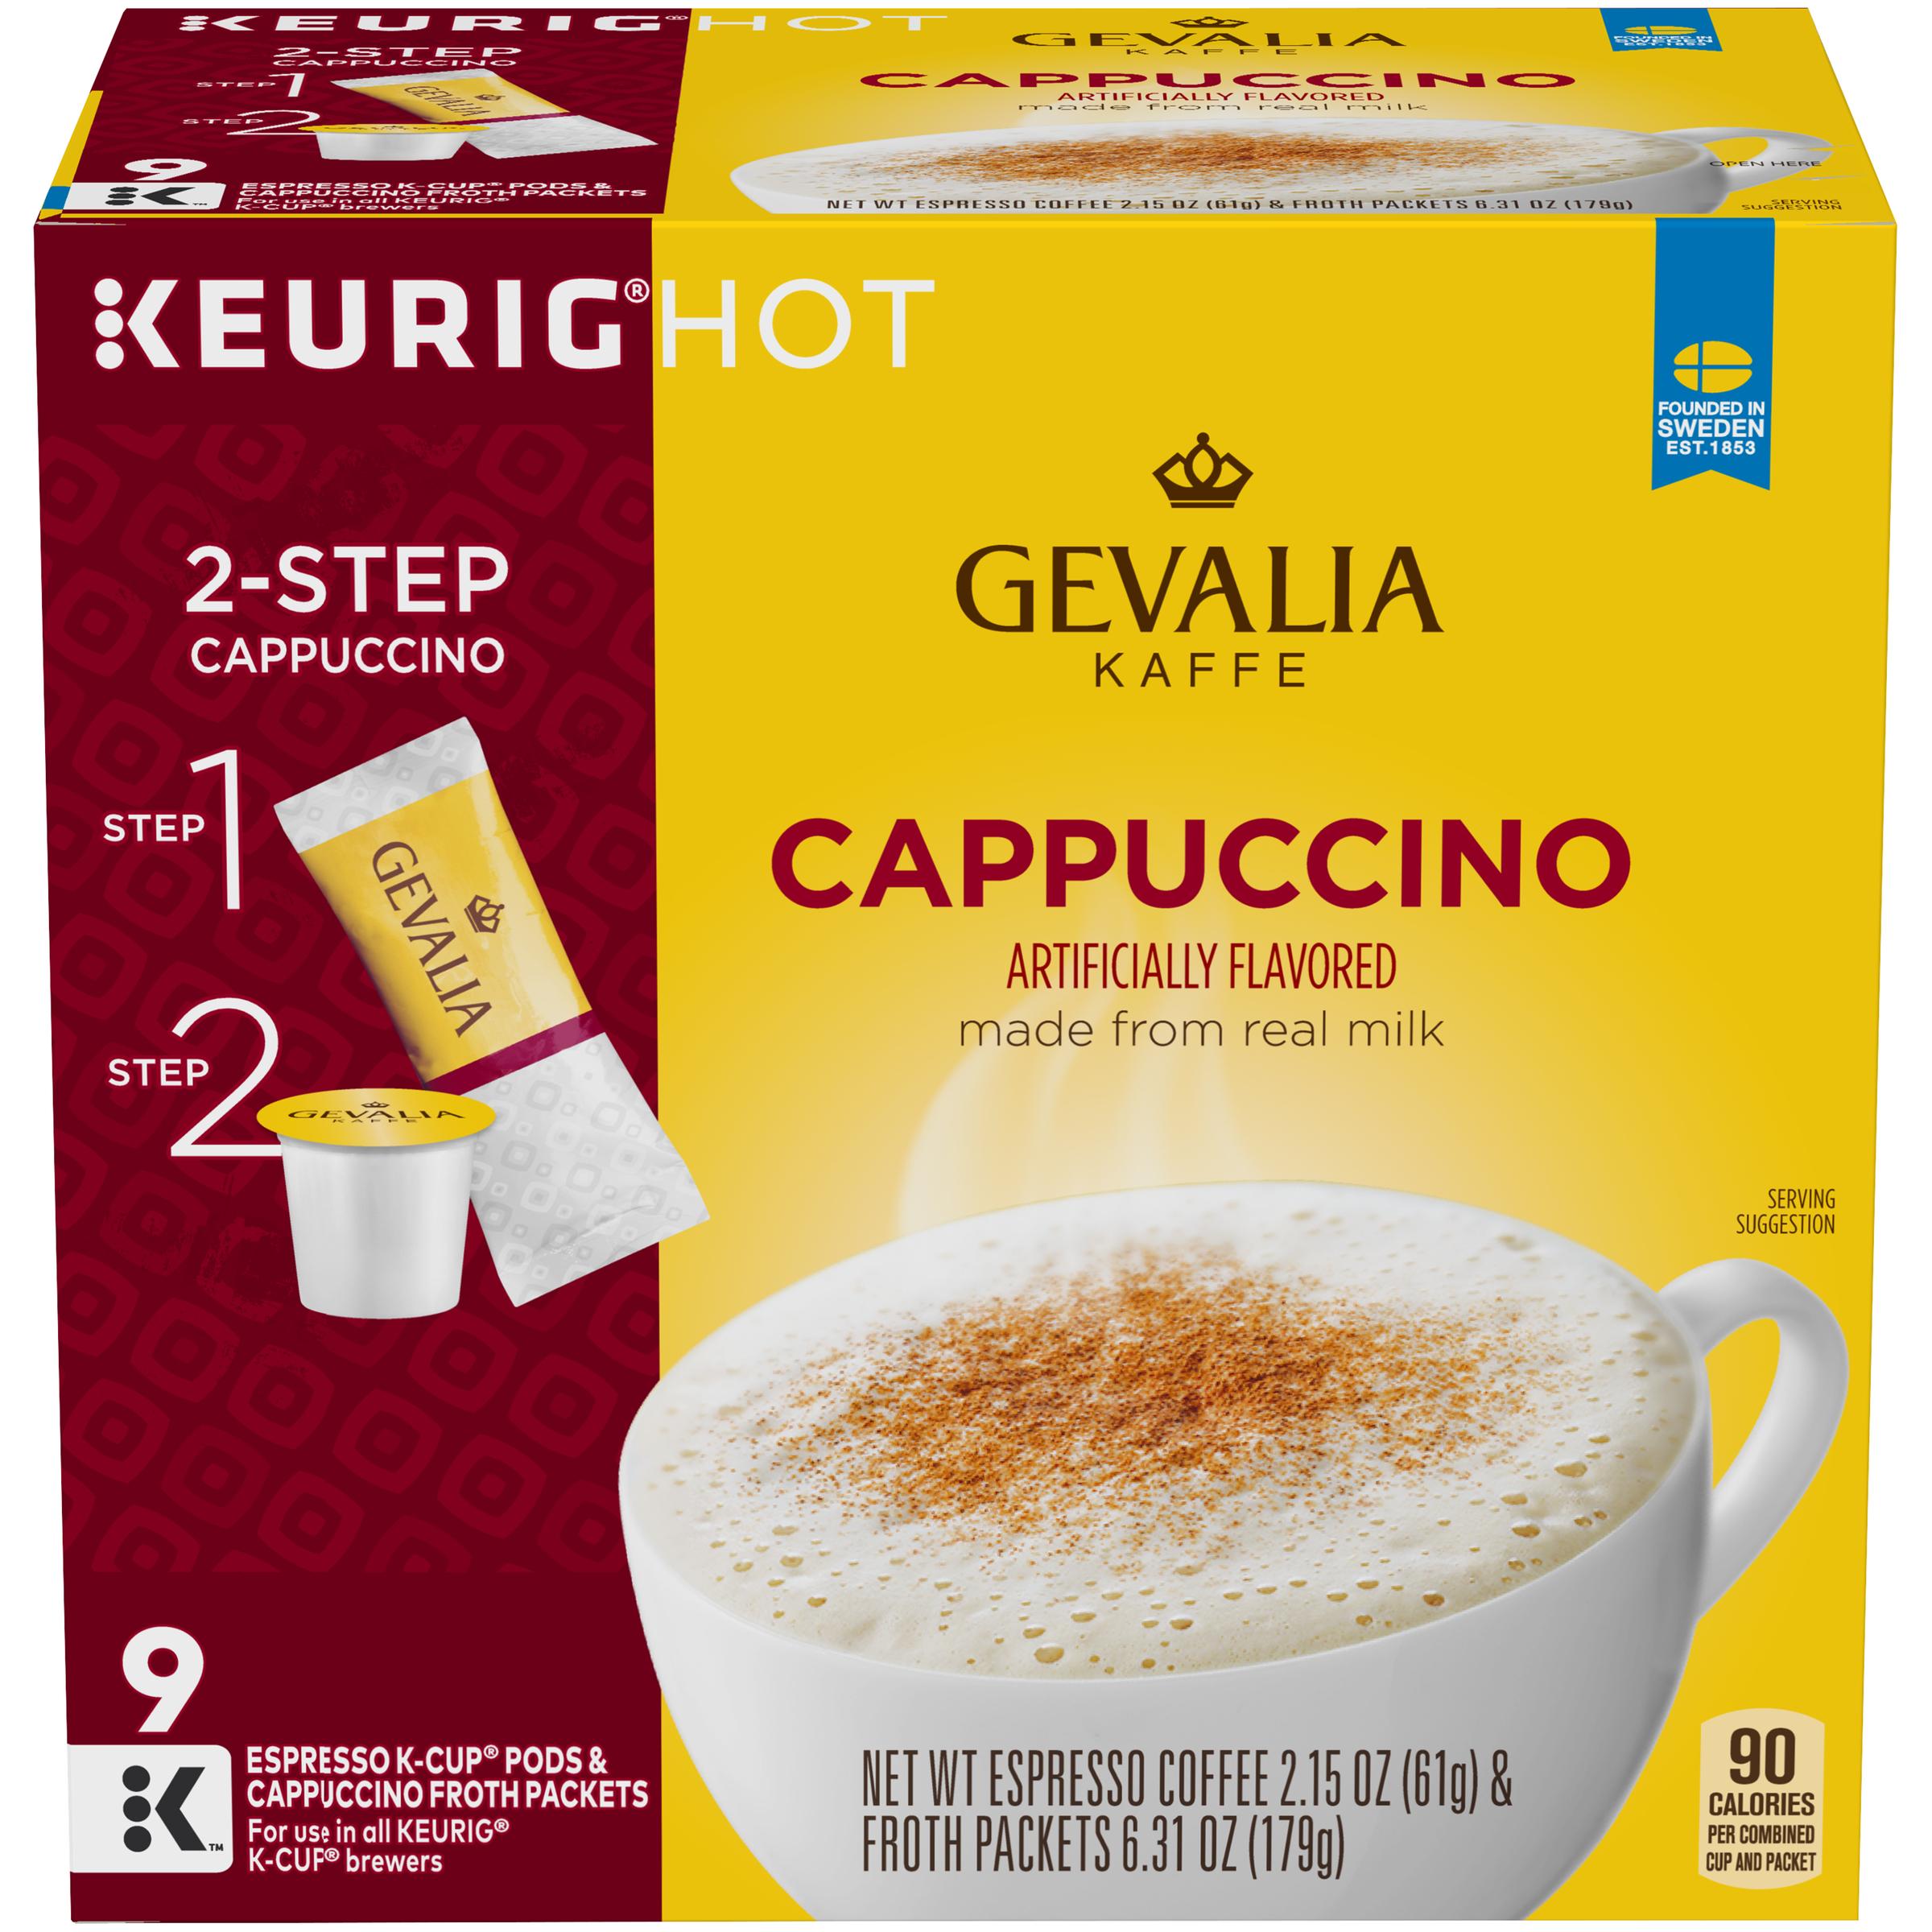 Gevalia Cappuccino Espresso Coffee K-Cup Pods